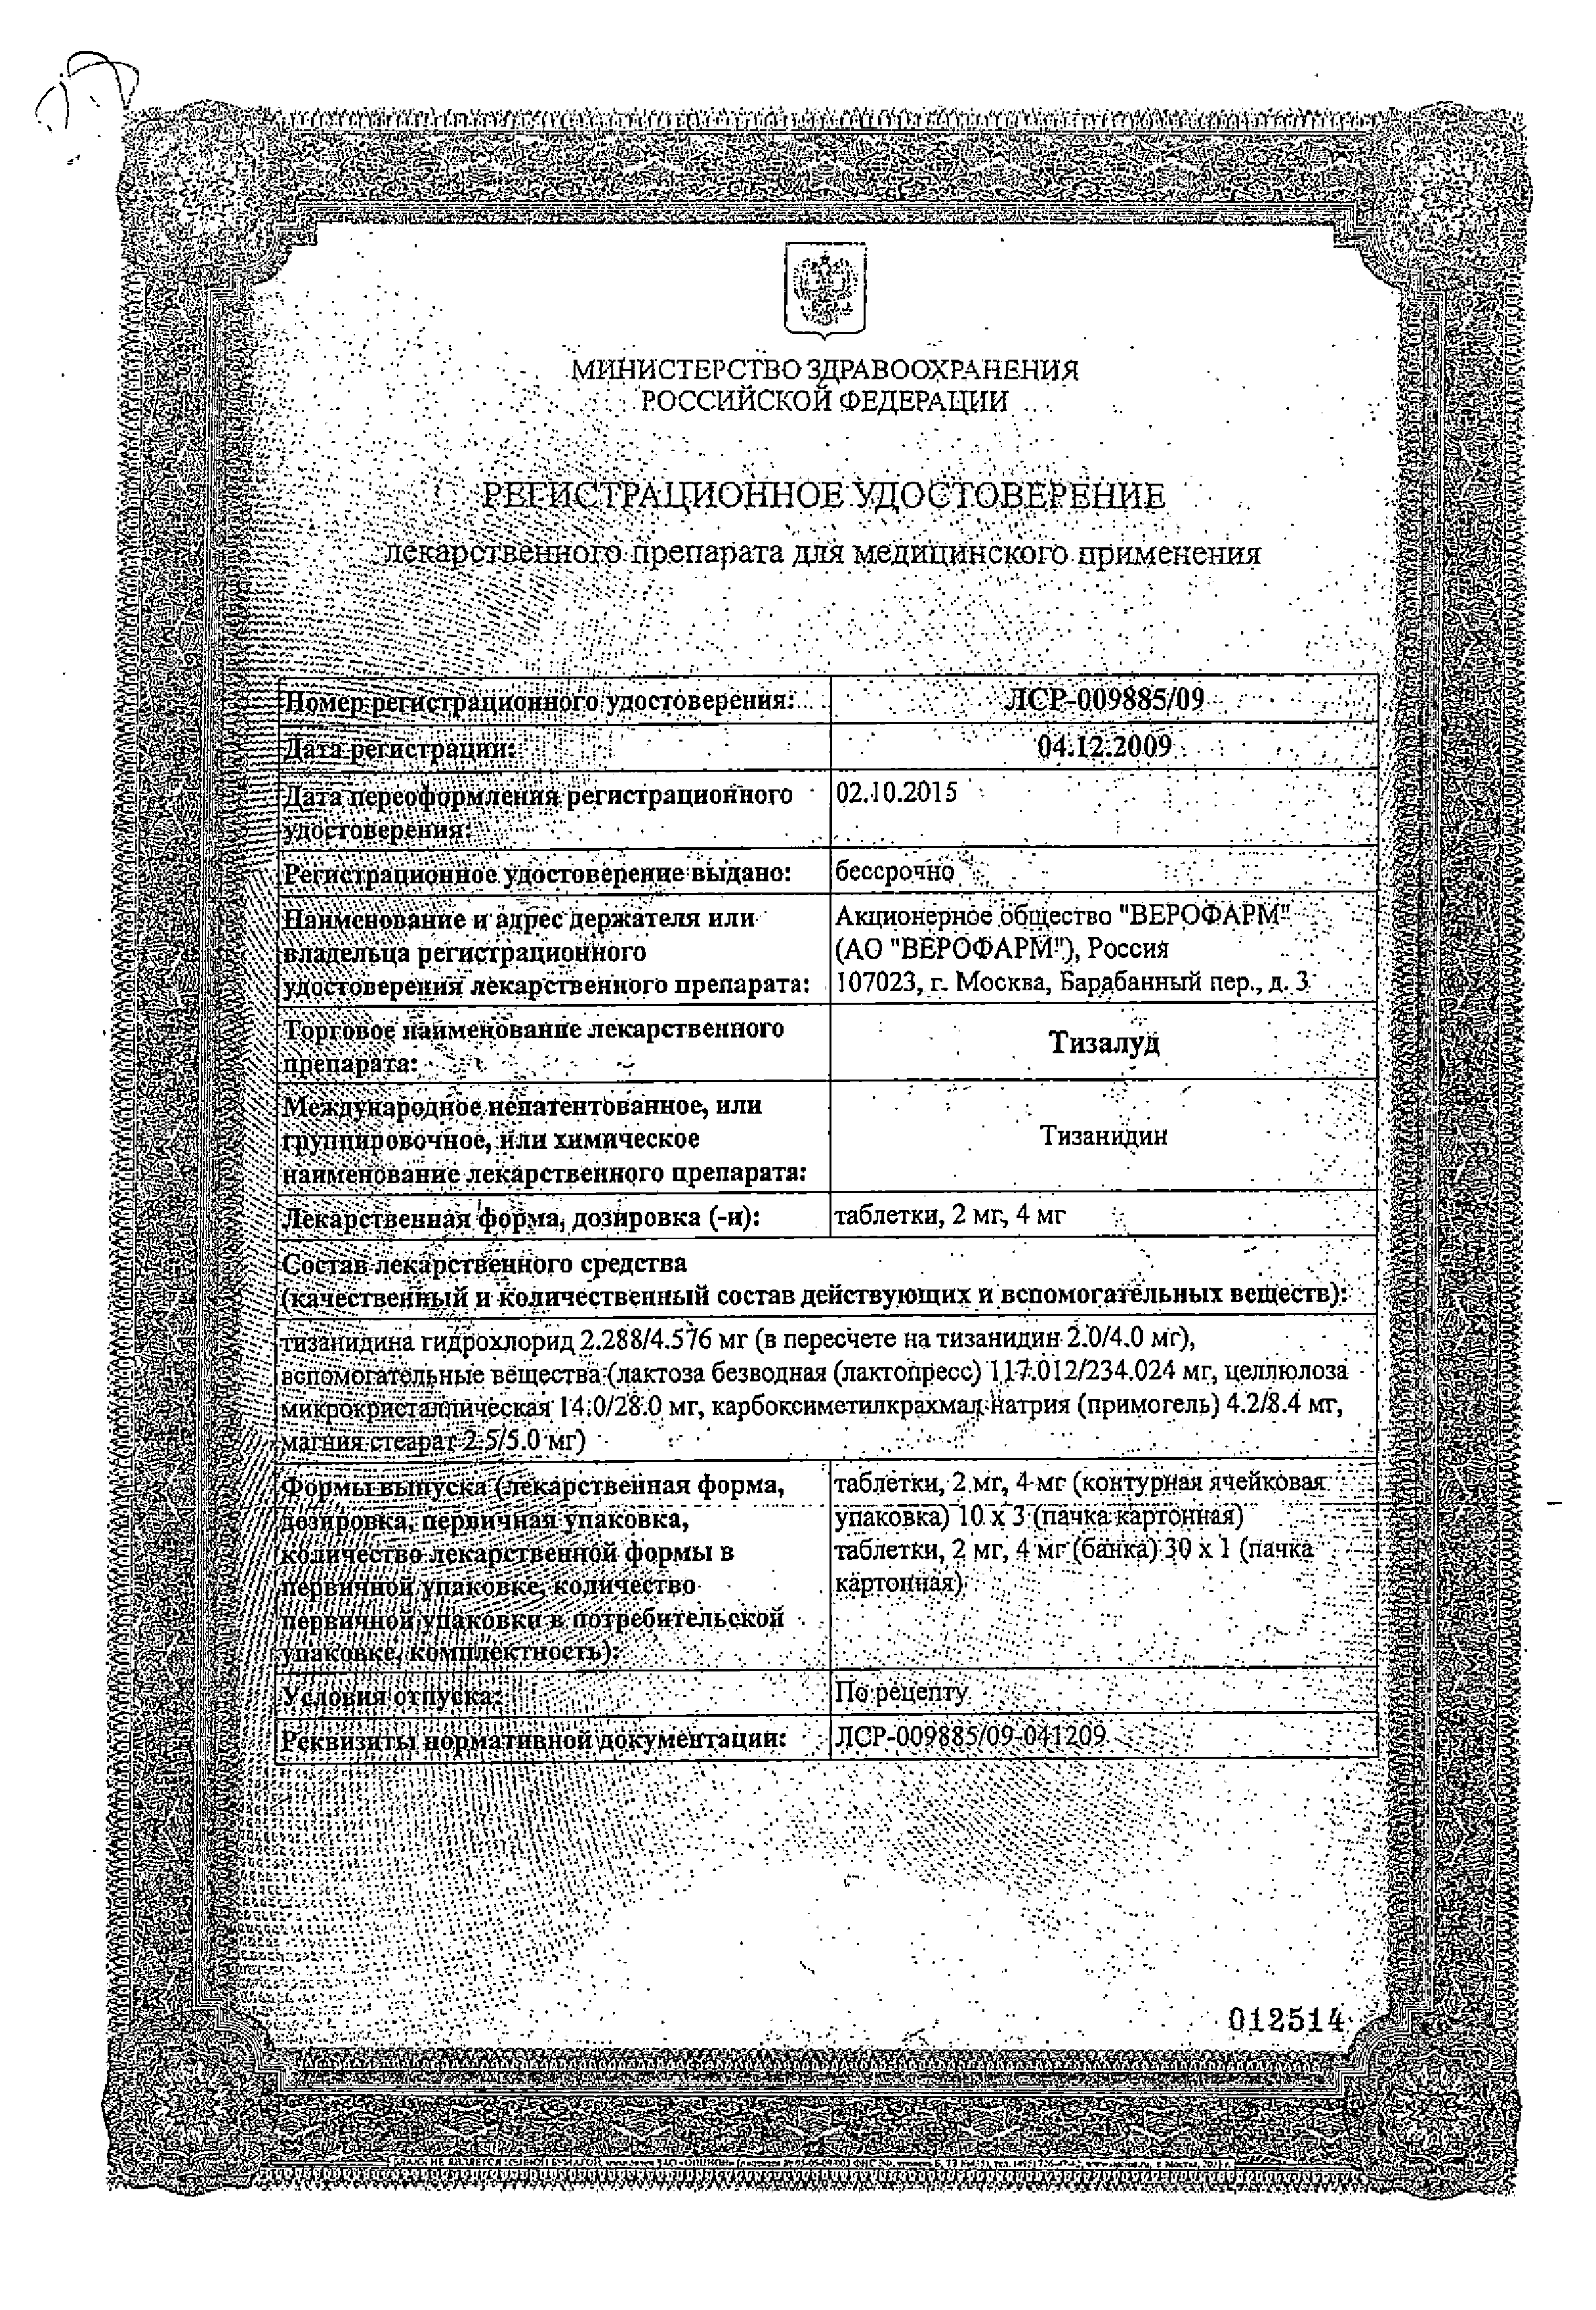 Тизалуд сертификат